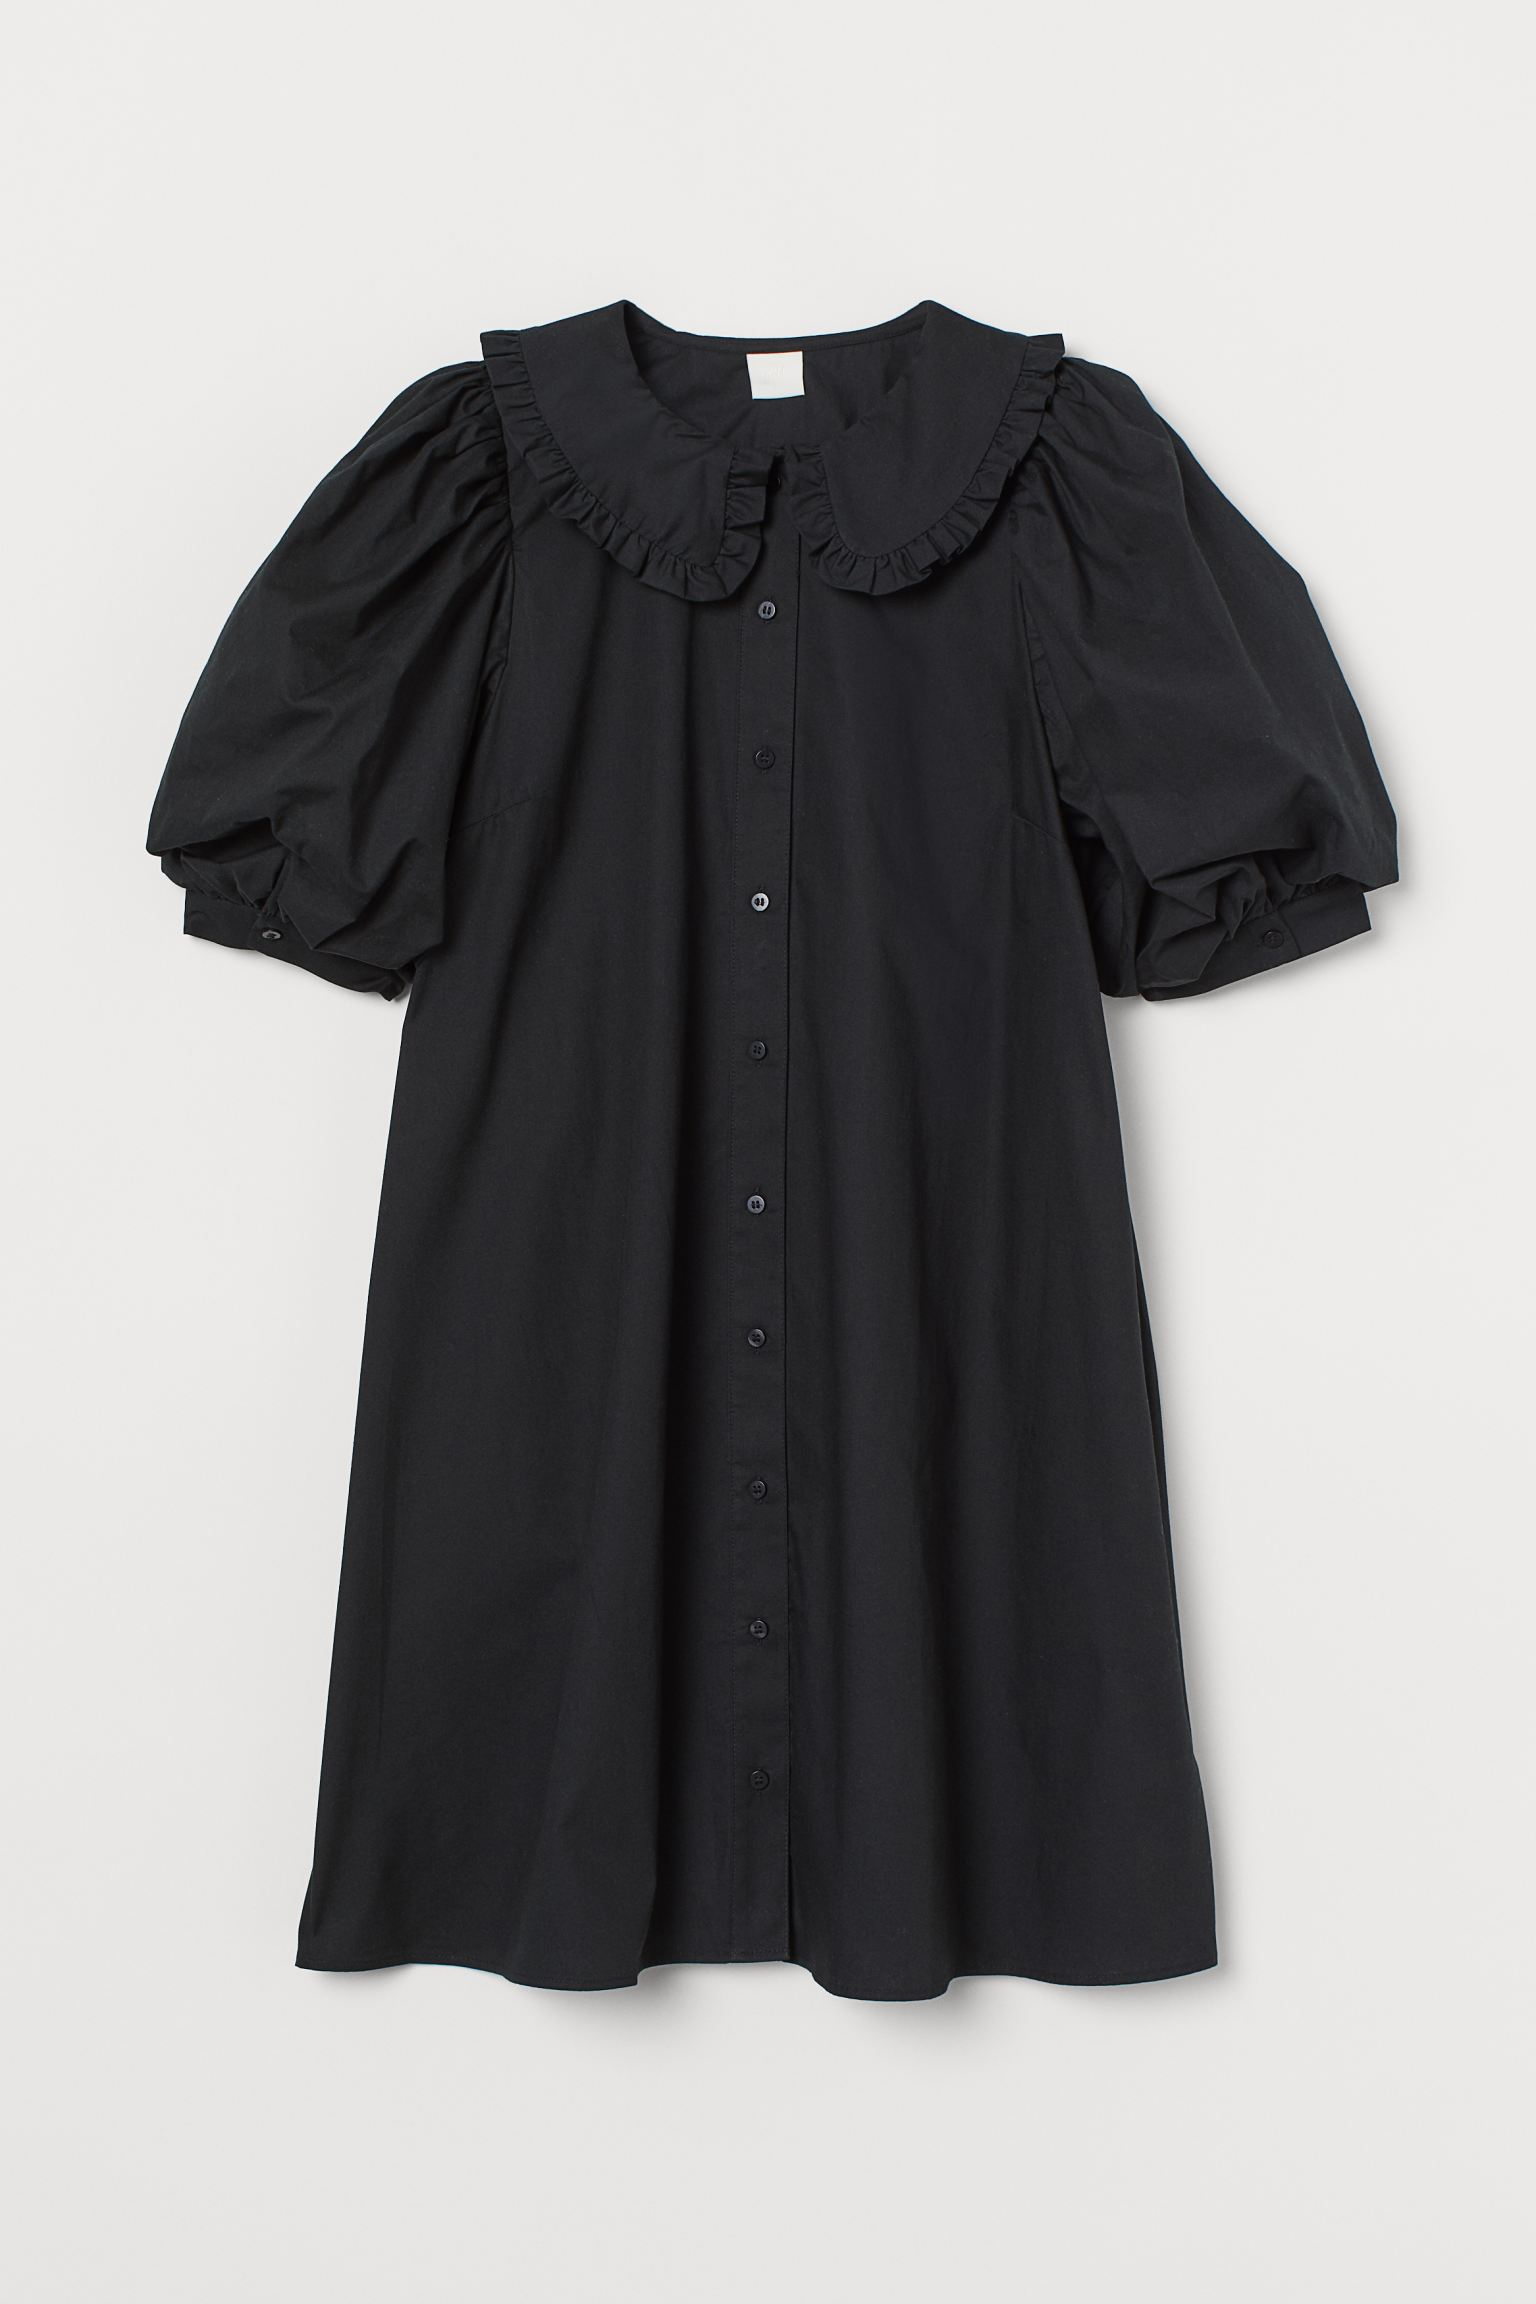 Vestido negro con cuello bobo